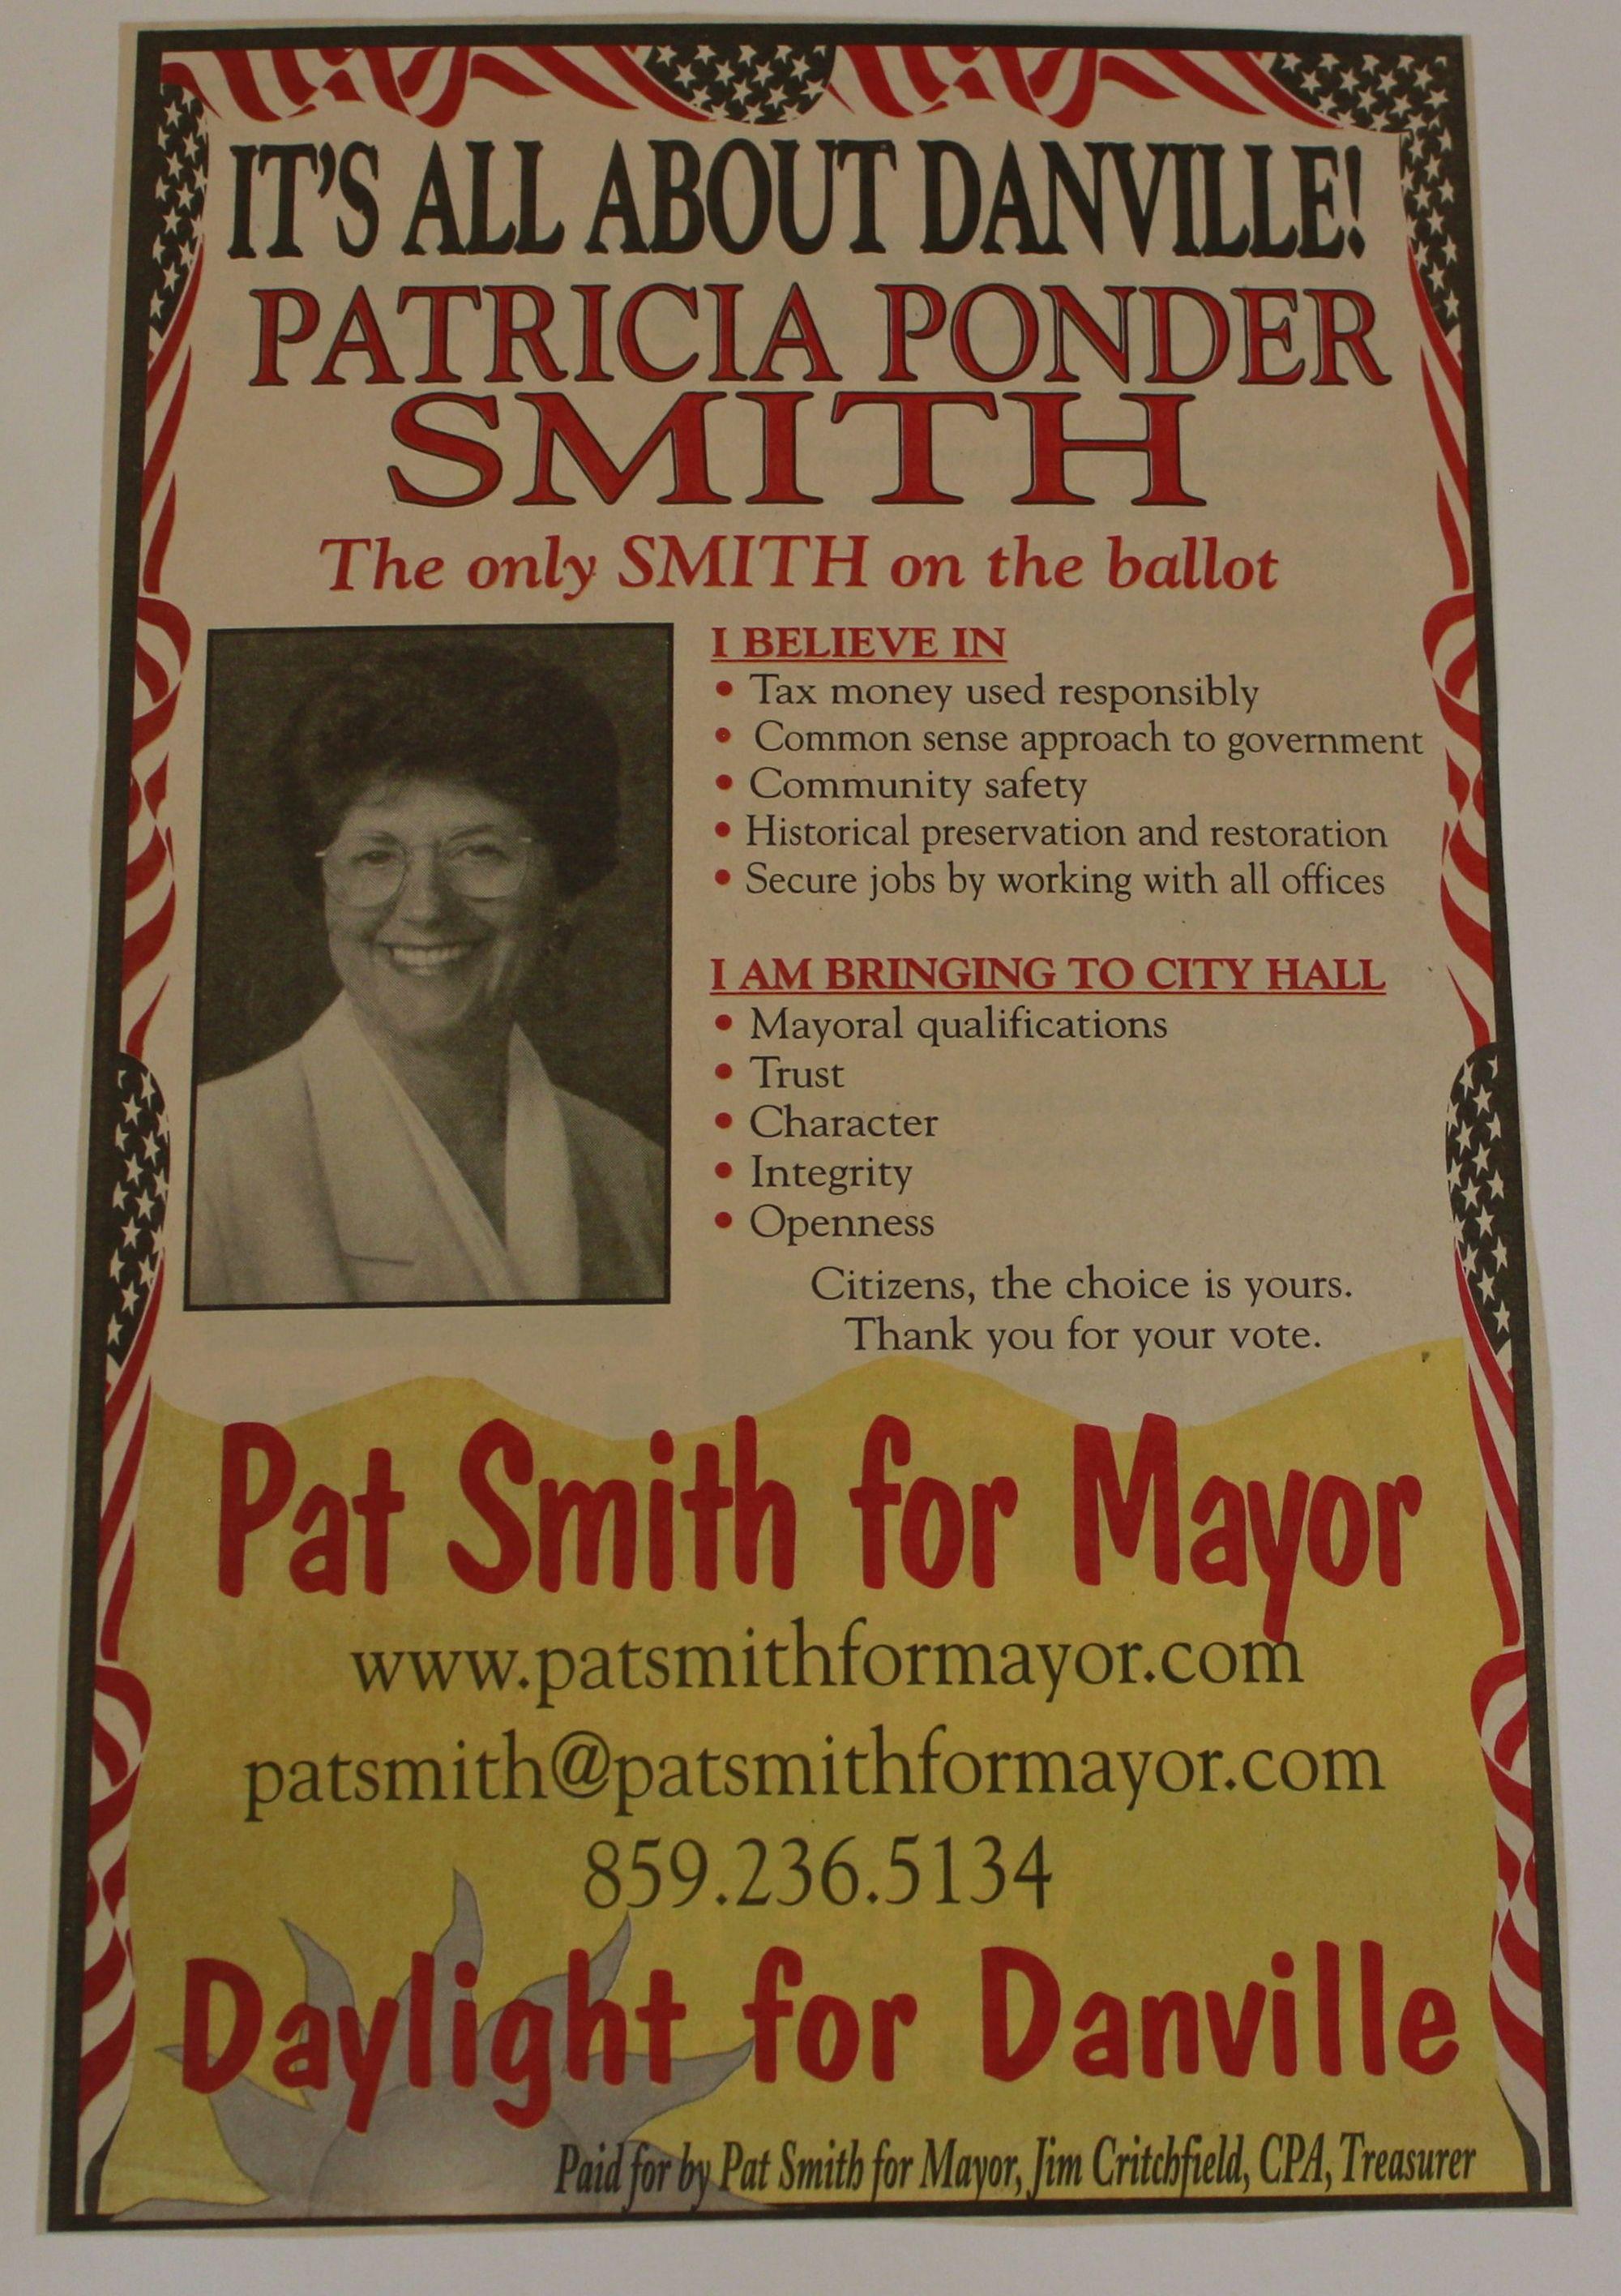 Danville Mayor